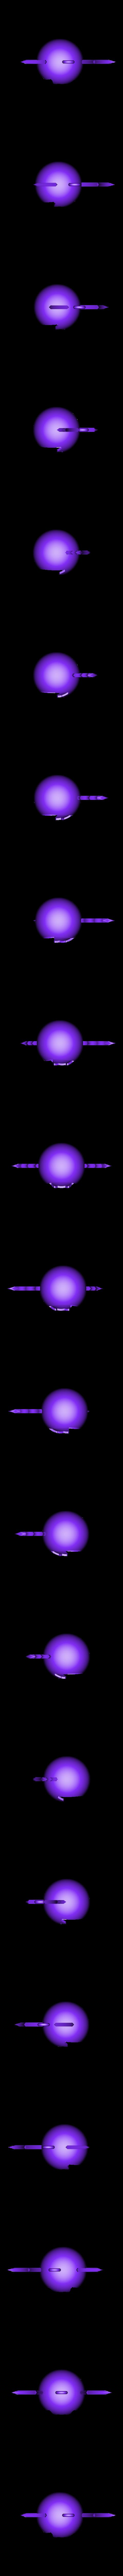 bat_ball.stl Download free STL file BatBall & GhostGlobe • 3D printer design, tone001